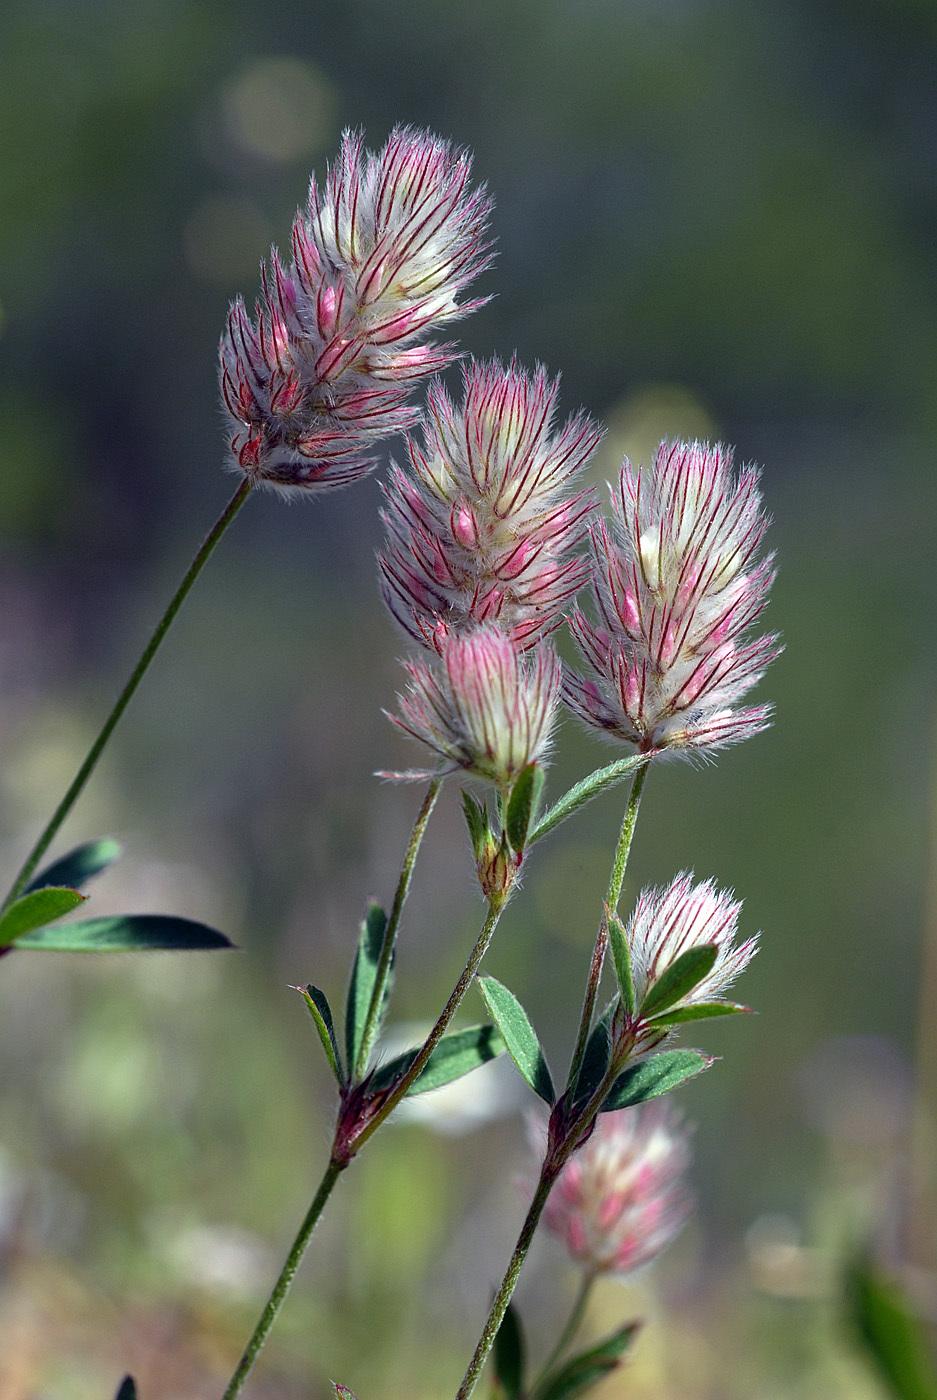 https://pictures.bgbm.org/digilib/Scaler?fn=Cyprus/Trifolium_arvense_B1.jpg&mo=file